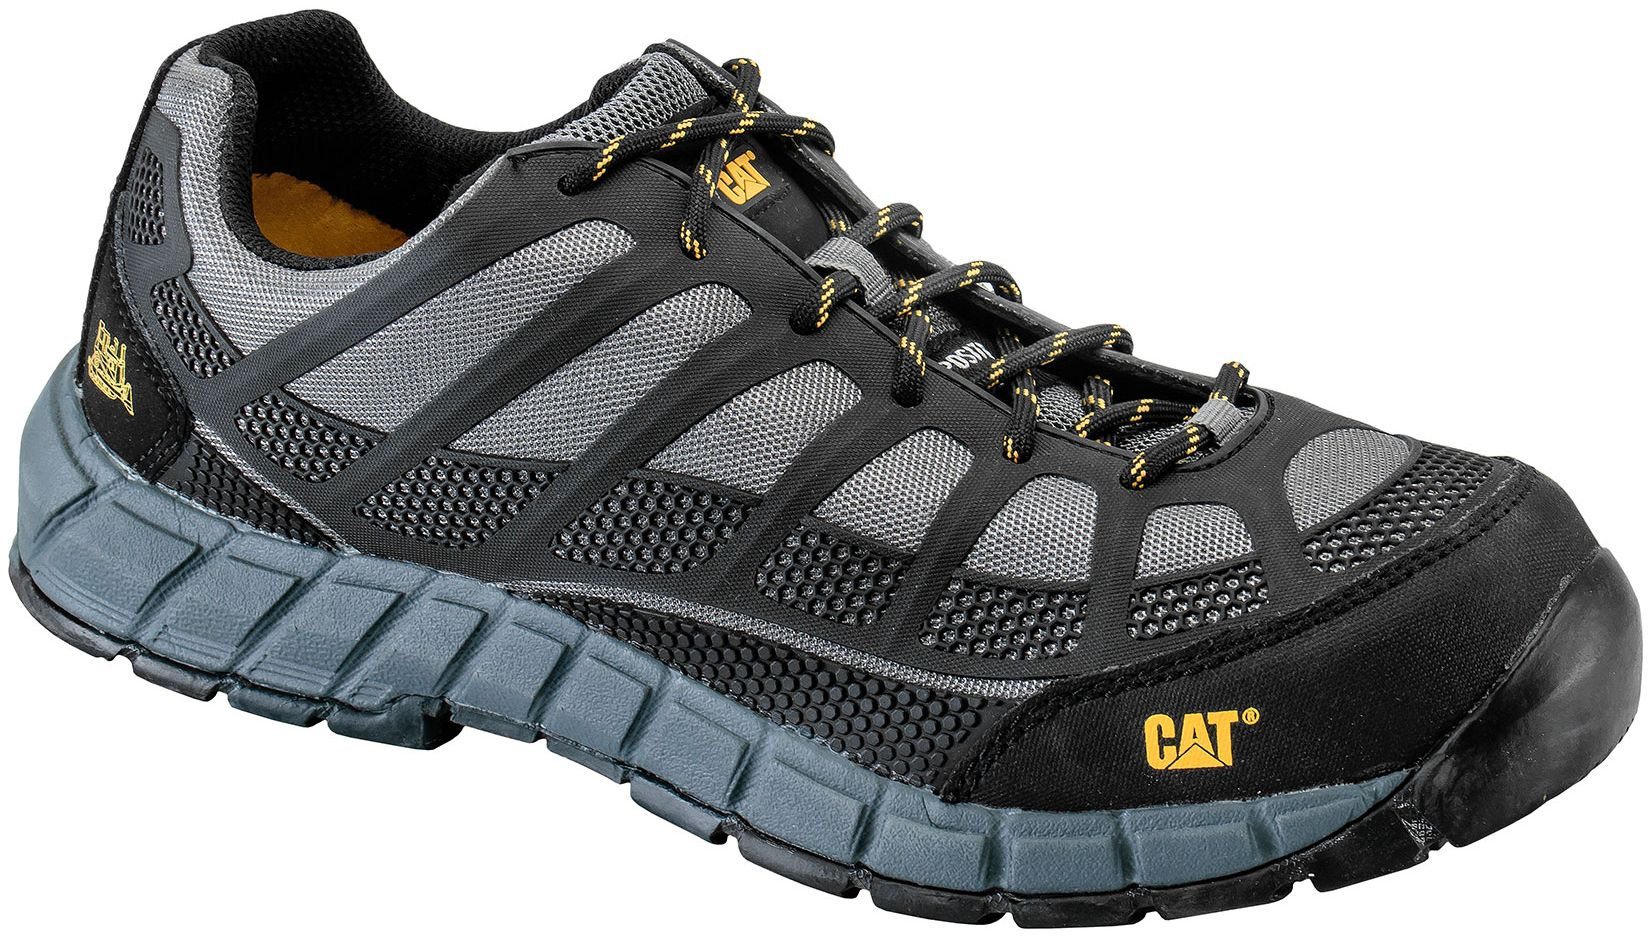 Caterpillar Streamline Ct S1p Hro Src Mens Work Shoes Mens Work Shoes Boots Shoes